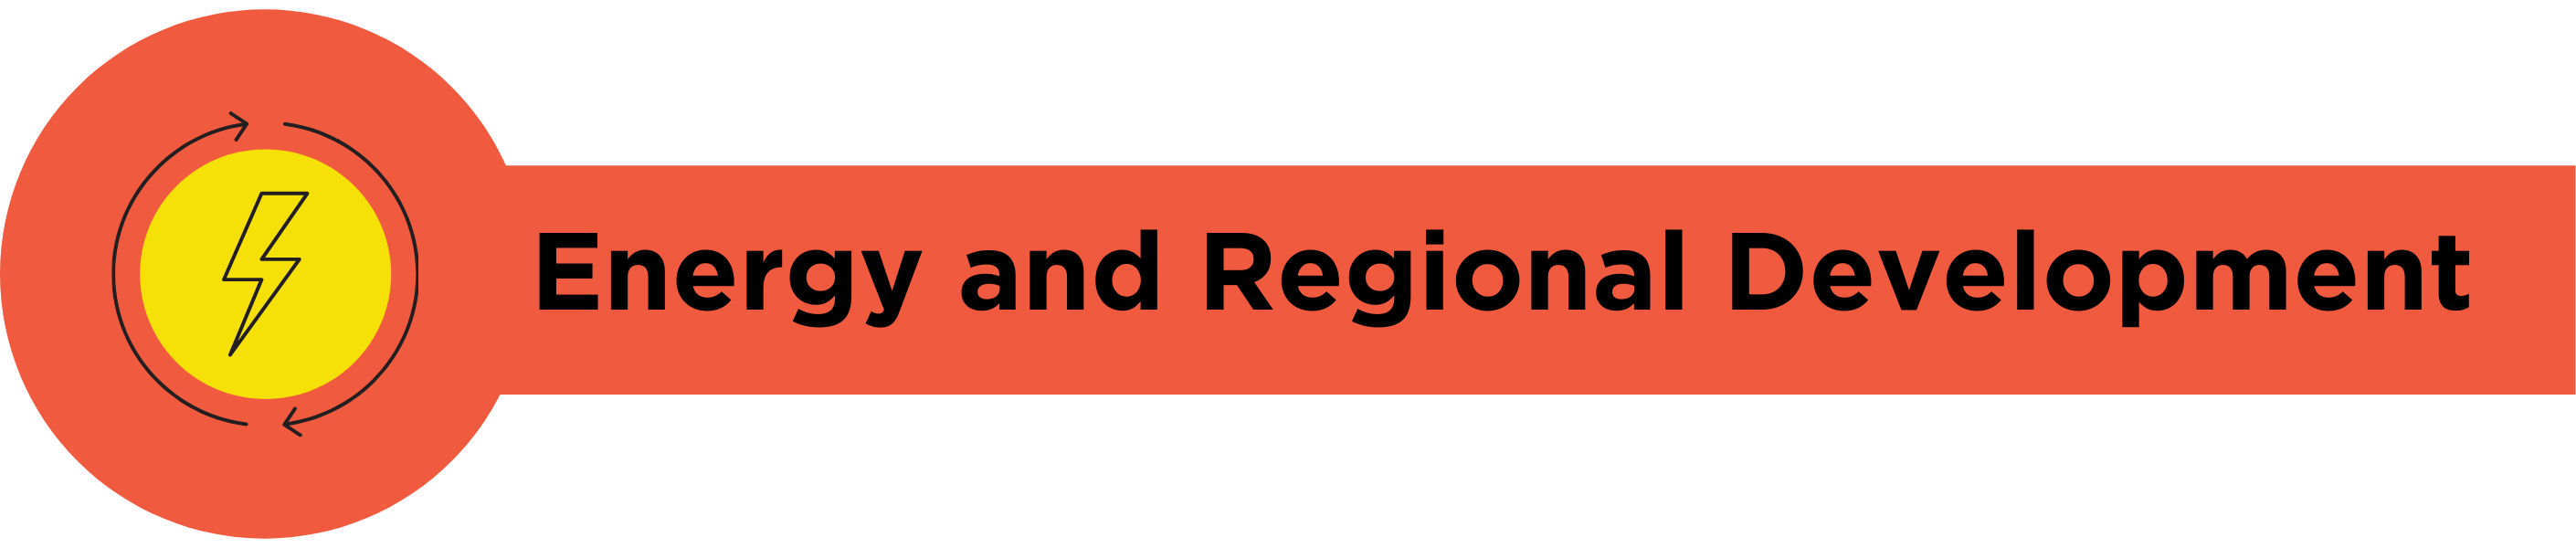 Energy and Regional Development